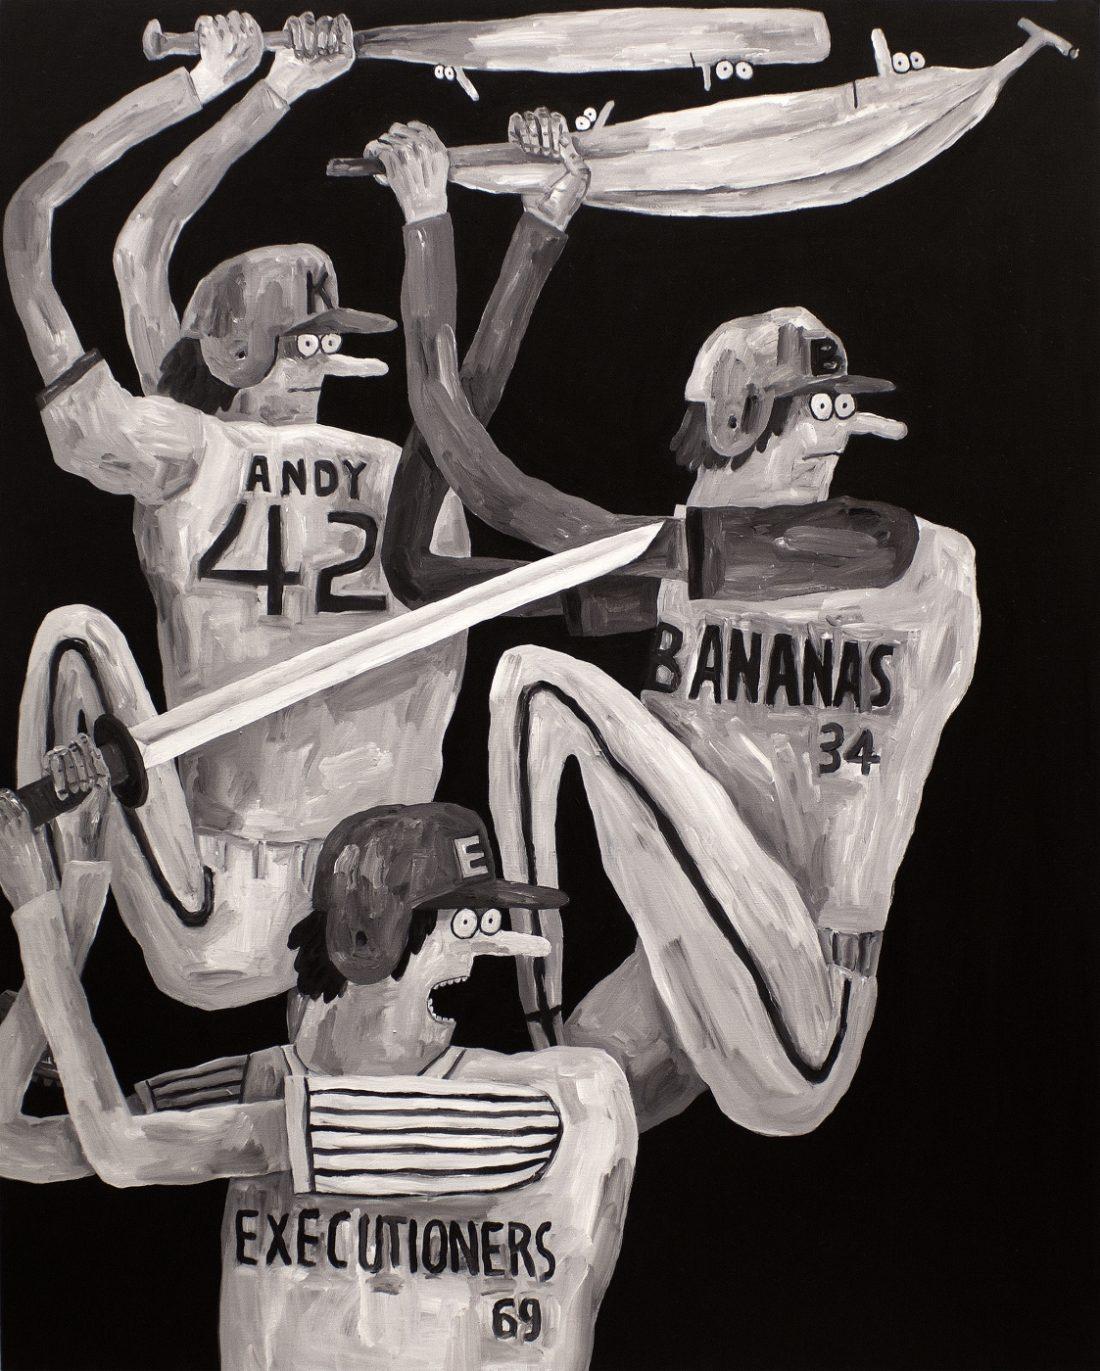 Hit, 2014, acrylic on canvas, 1,303x1,622mm